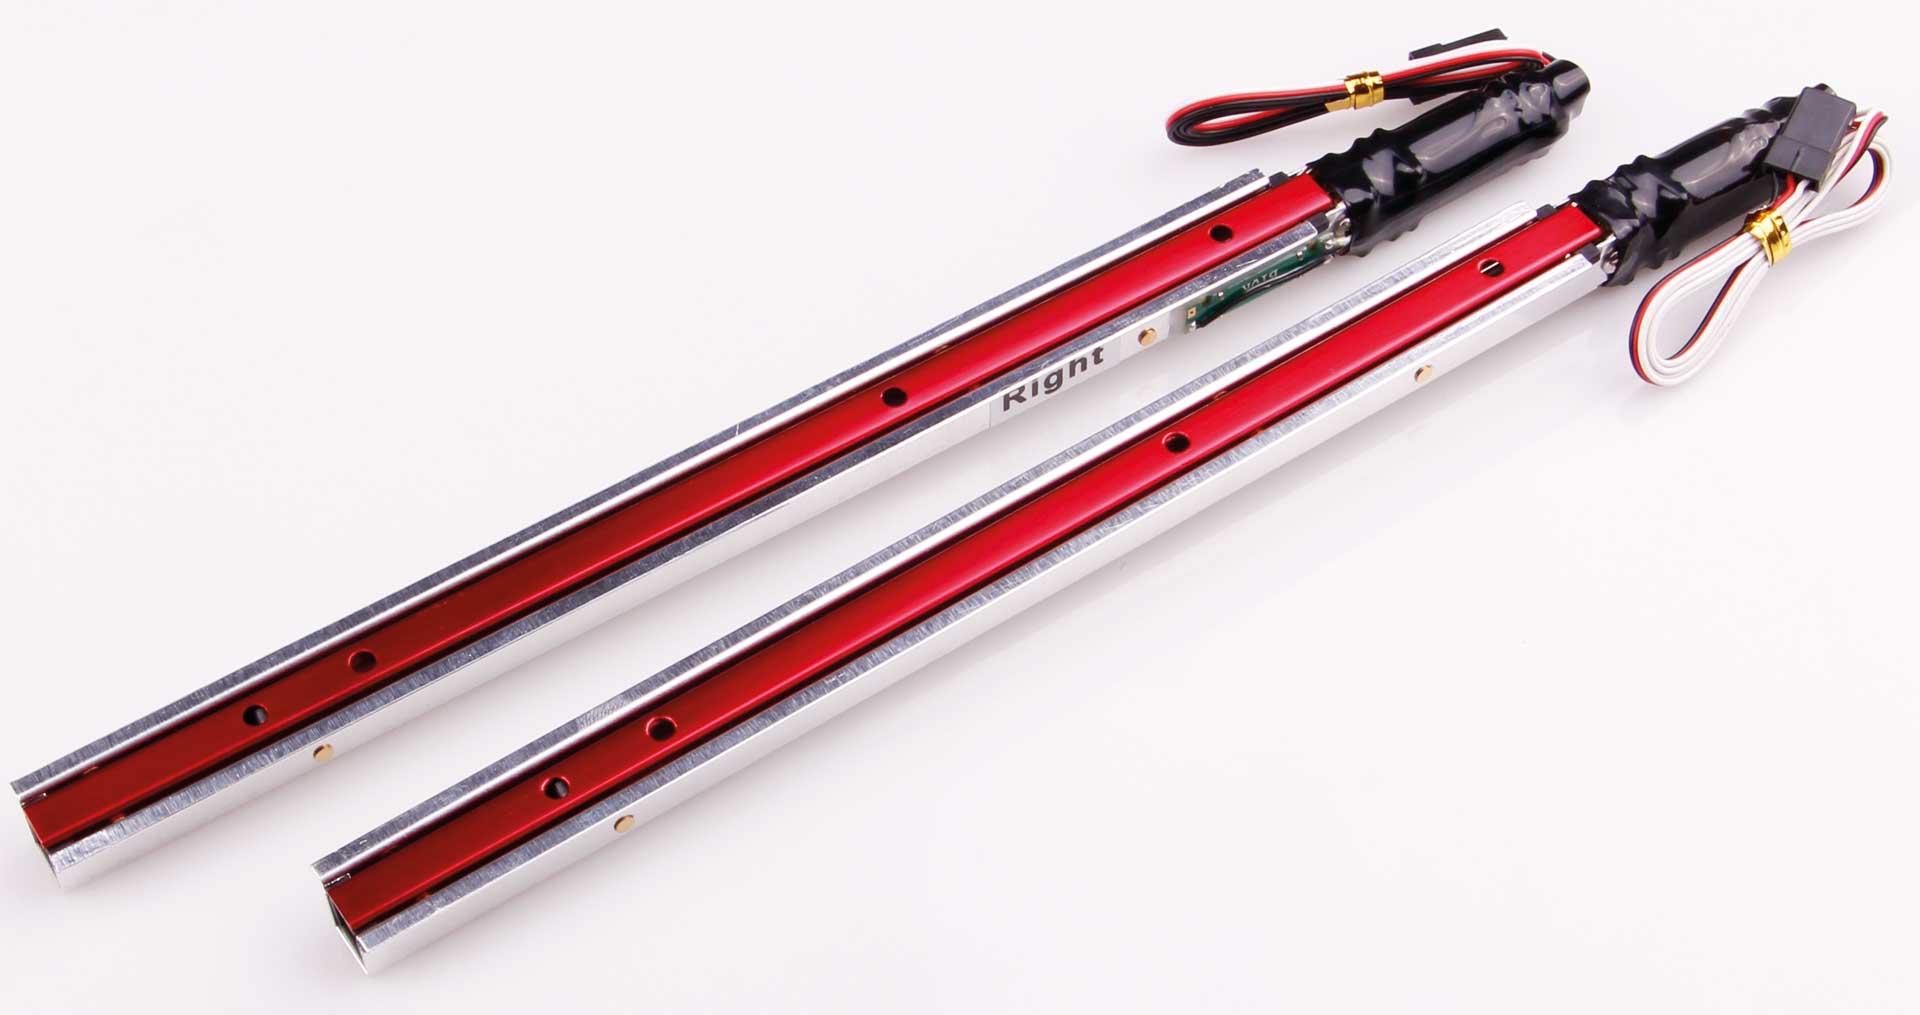 Robbe Modellsport Landeklappen 180mm elektrisch HV ready